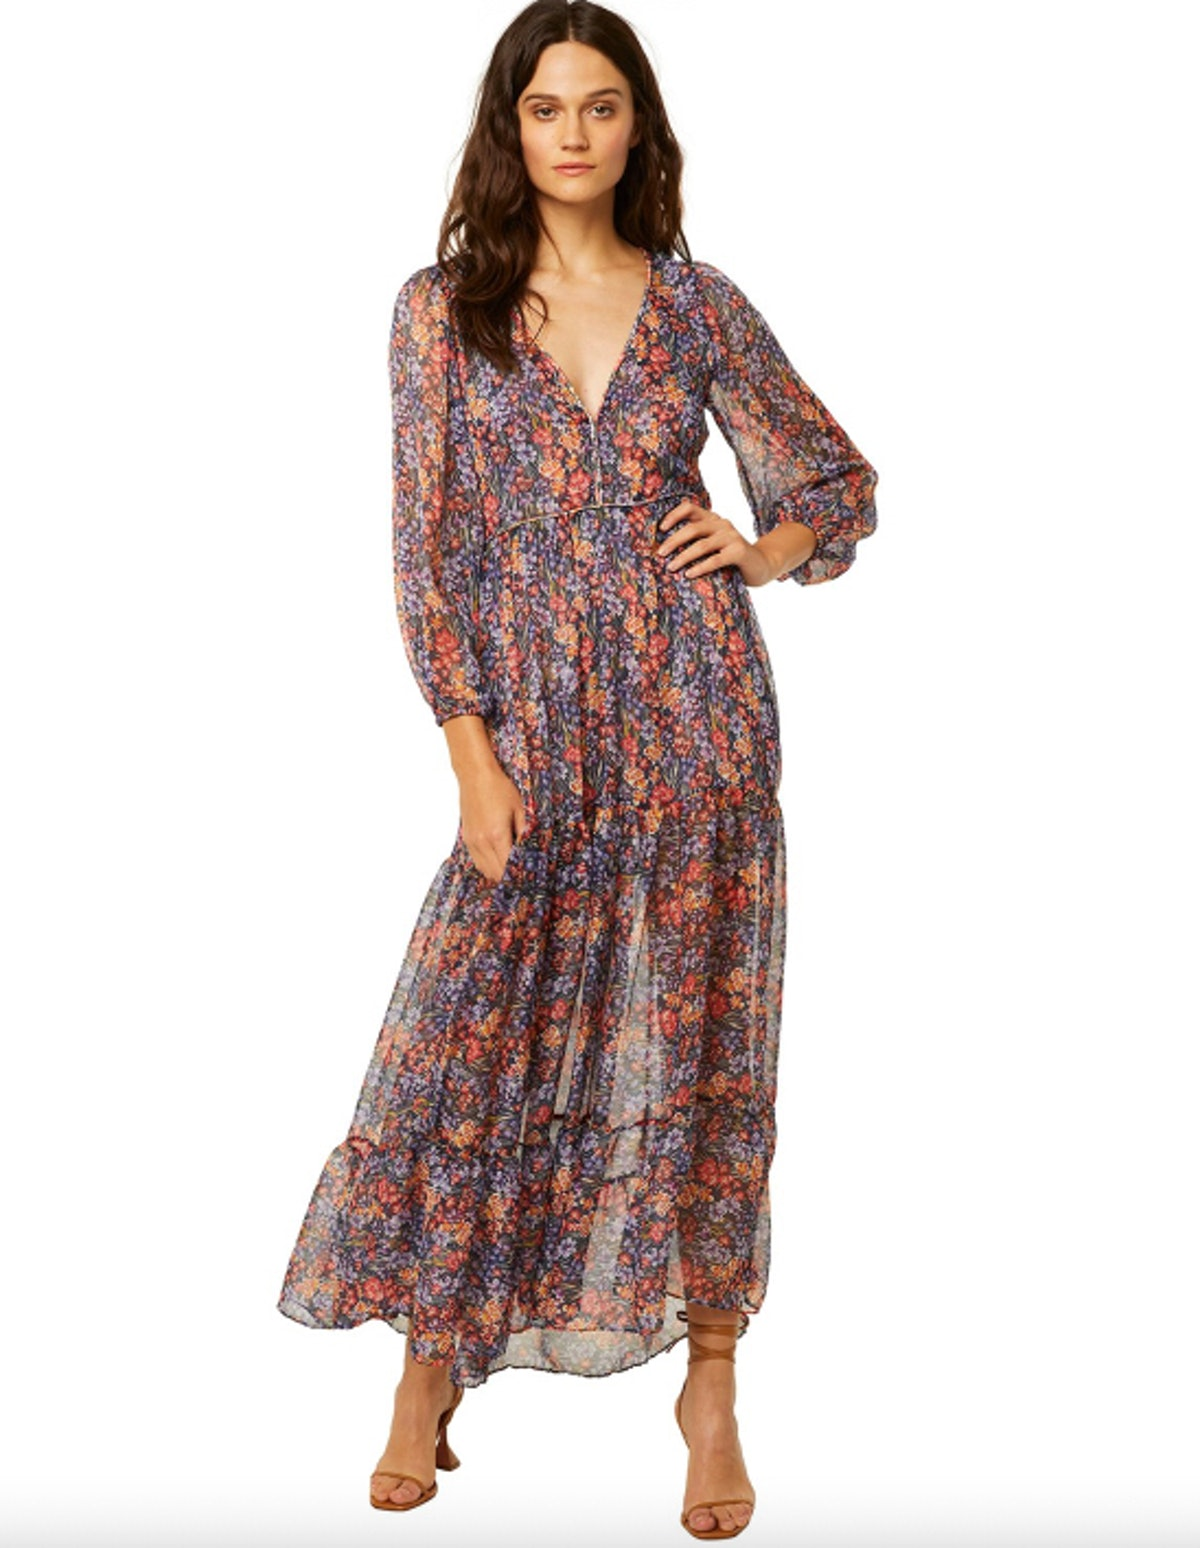 Misa Los Angeles Anahita Dress